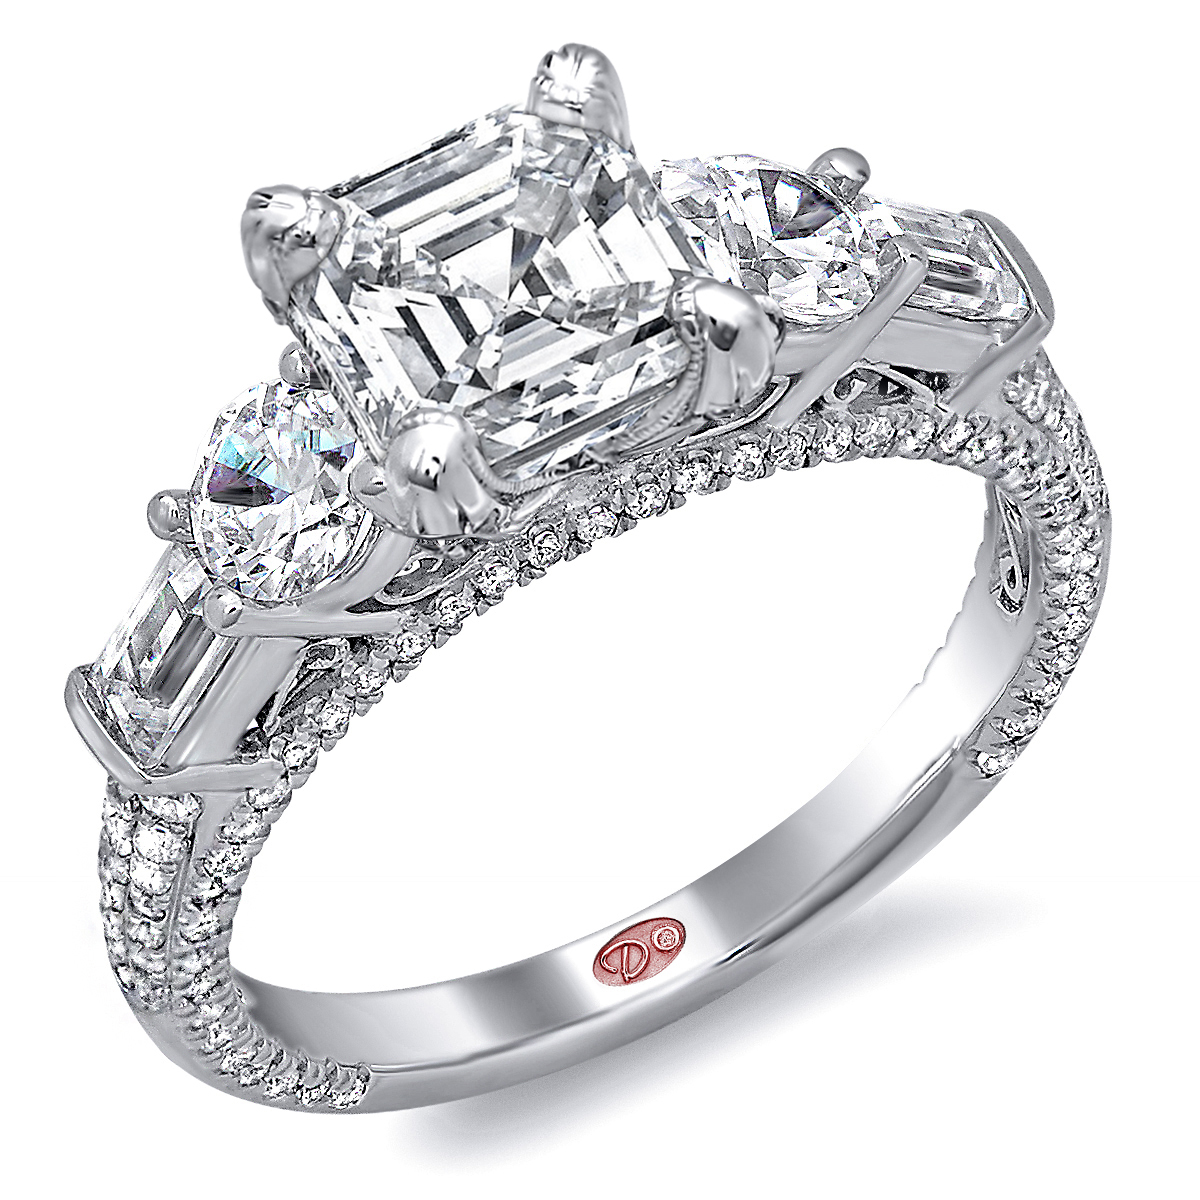 unique engagement rings dw4875. Black Bedroom Furniture Sets. Home Design Ideas